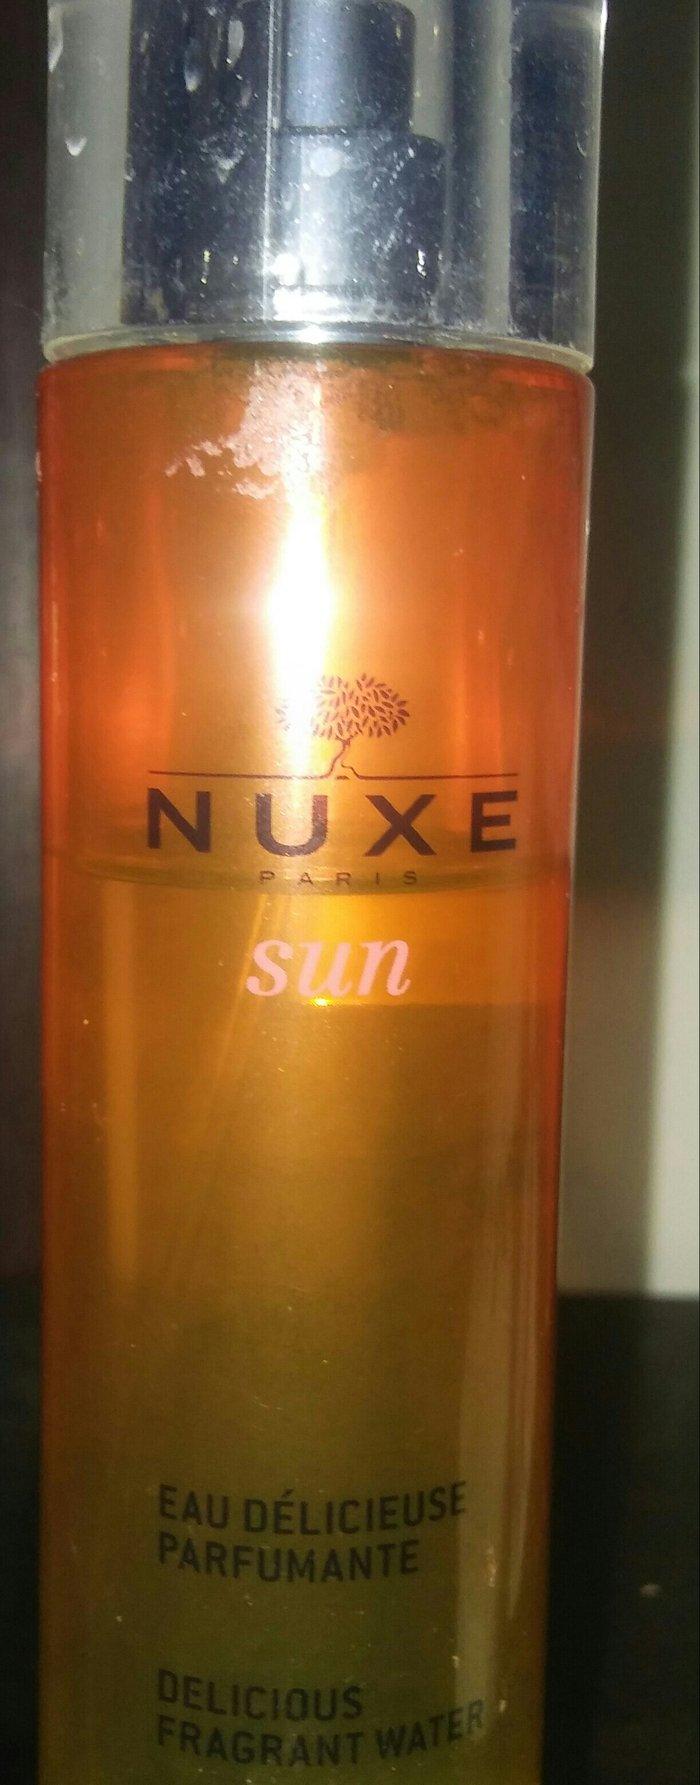 Nuxe. sun mist . ιδανικο για καλοκαιρι. Photo 4